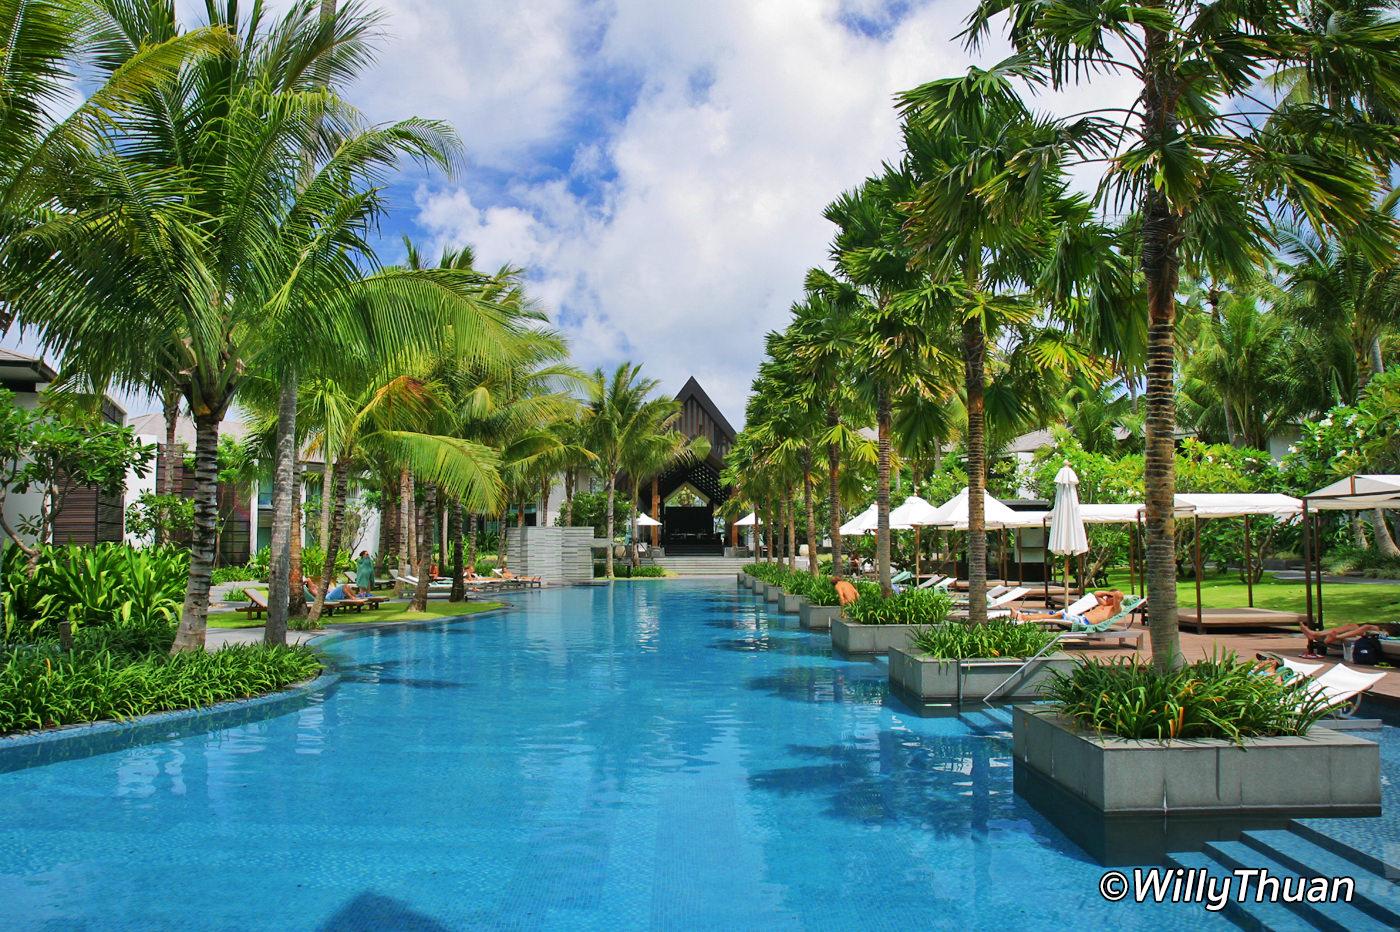 Cheap Hotels Near Phuket Airport